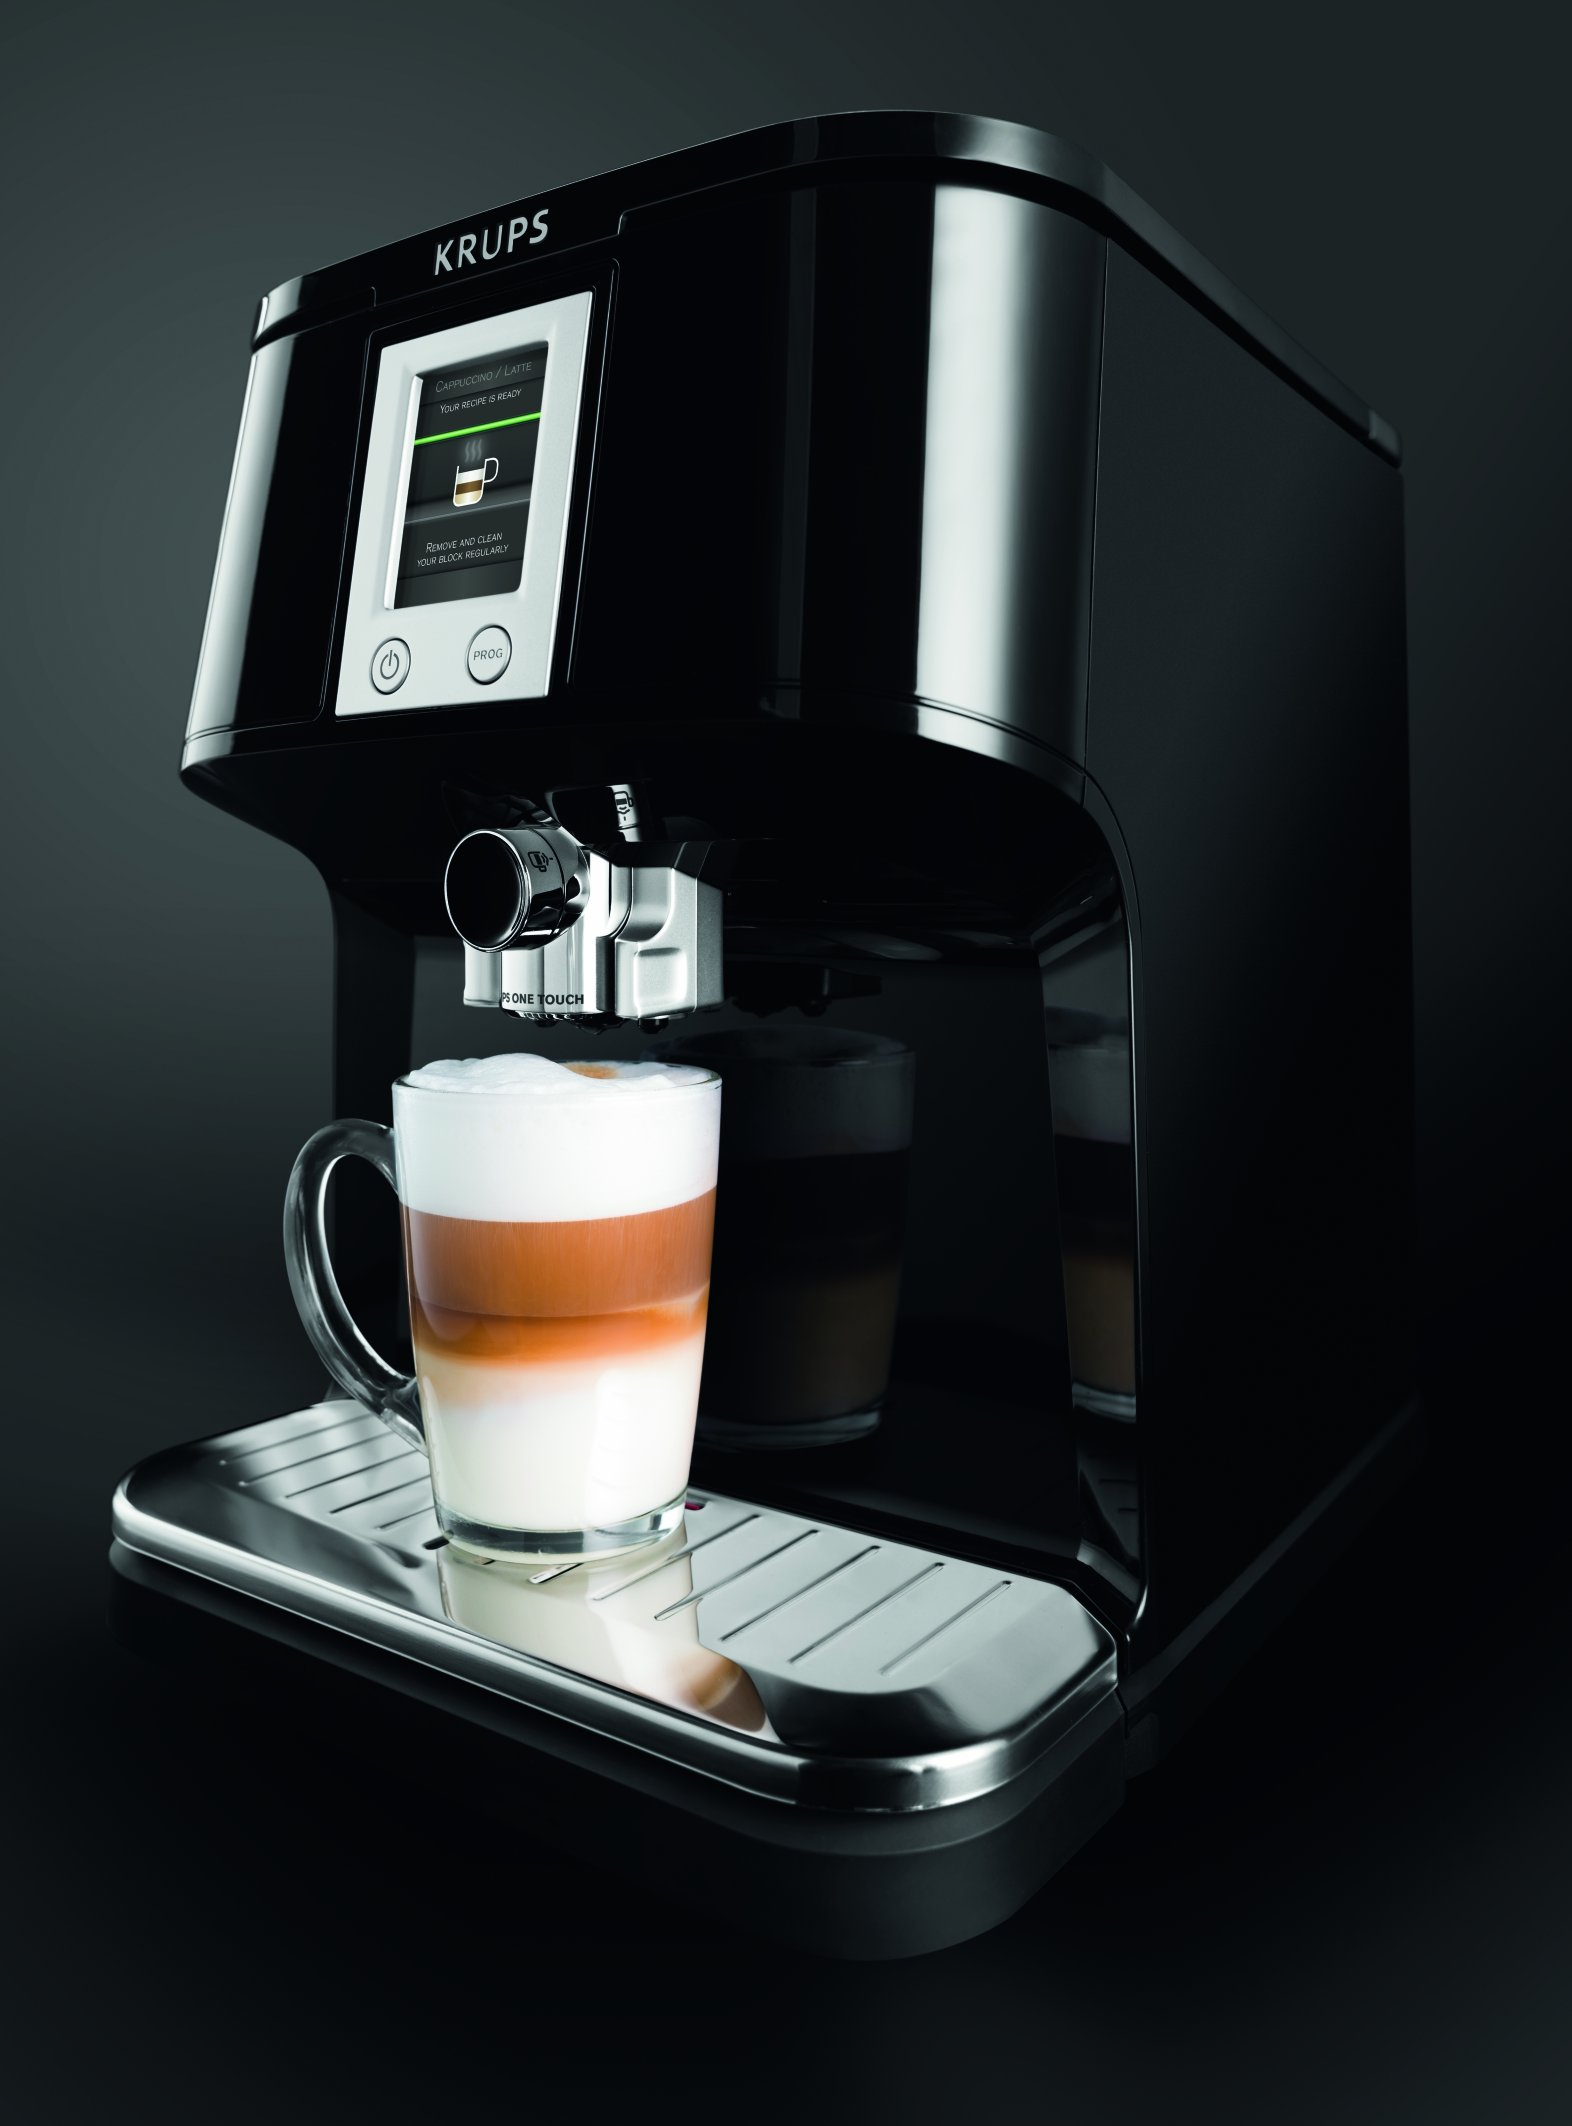 KRUPS-EA850B-Kaffeevollautomat-One-Touch-Funktion-17-l-15-bar-Touchscreen-Display-schwarz